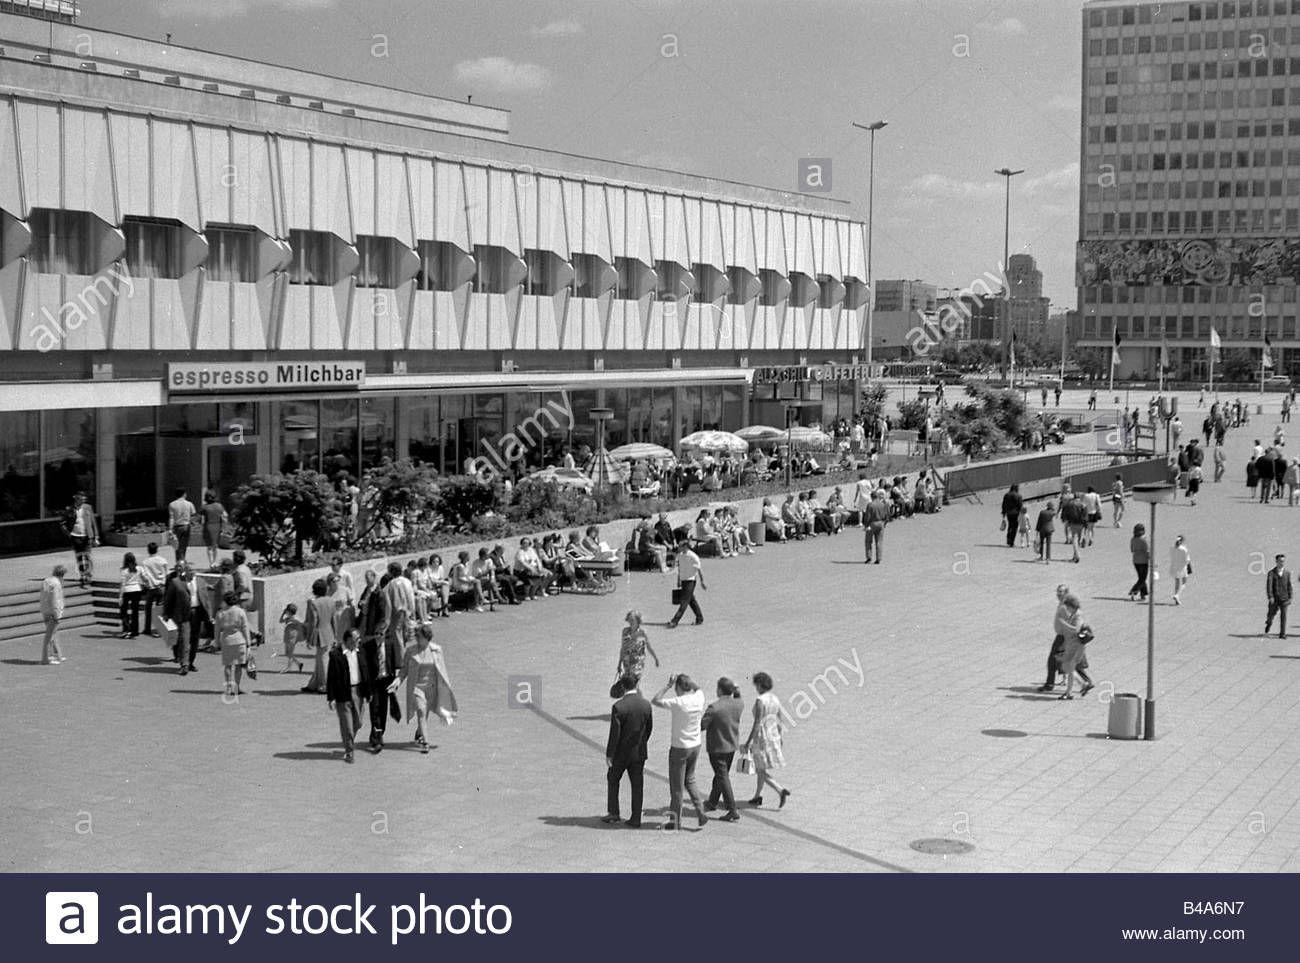 Alexanderplatz 1970 West Berlin Germany Berlin